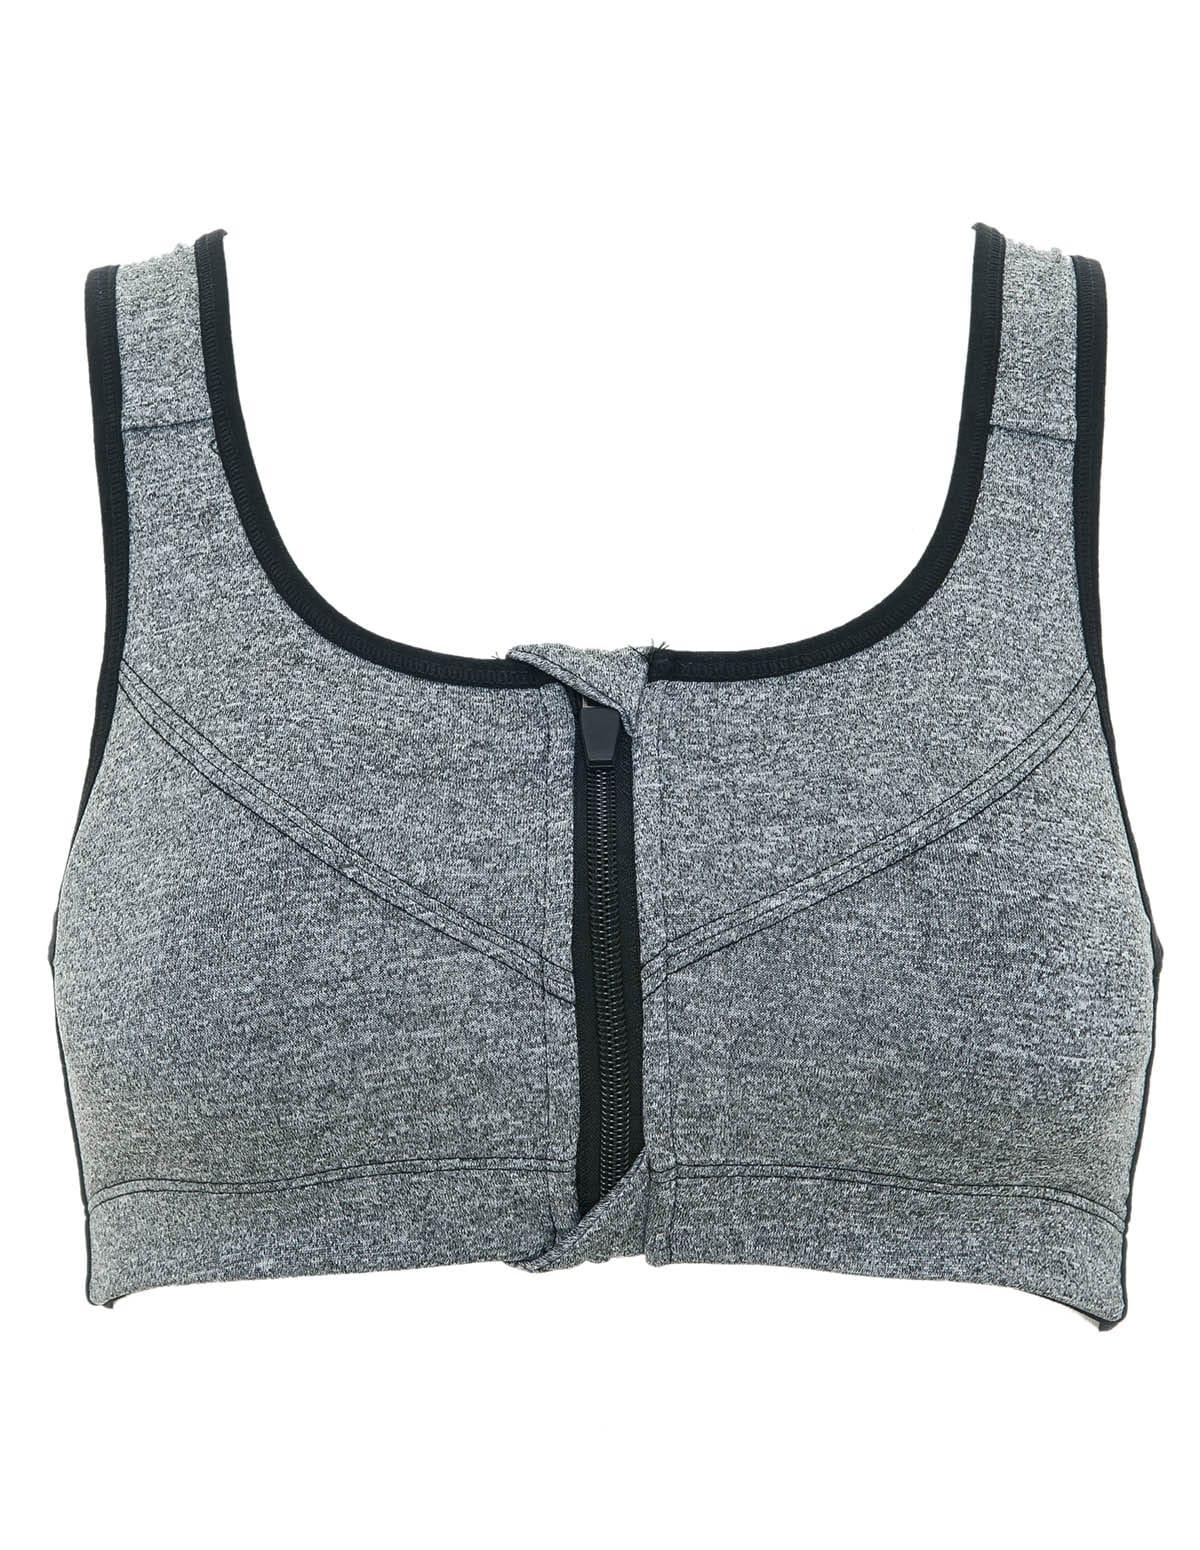 Home Γυναικεία Μπουστάκια Αθλητικά Γυναικείο αθλητικό μπουστάκι σε γκρι  χρώμα b145dc8c7f0